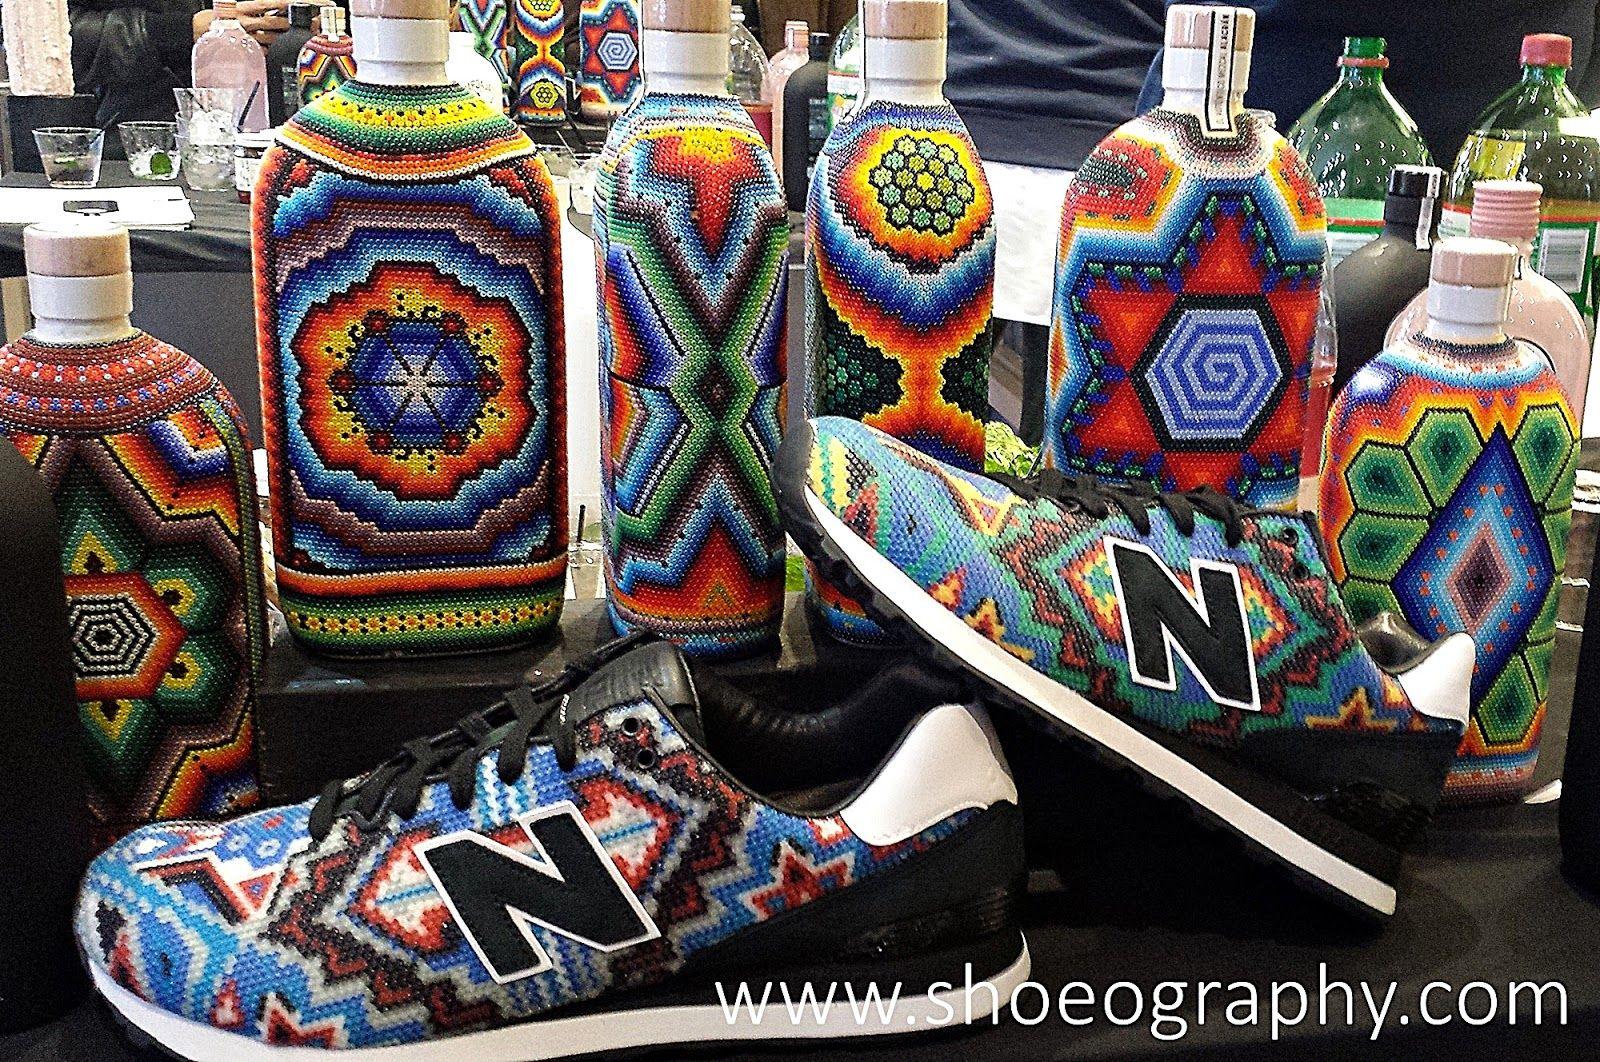 Ricardo Seco x New Balance 574 Sneakers